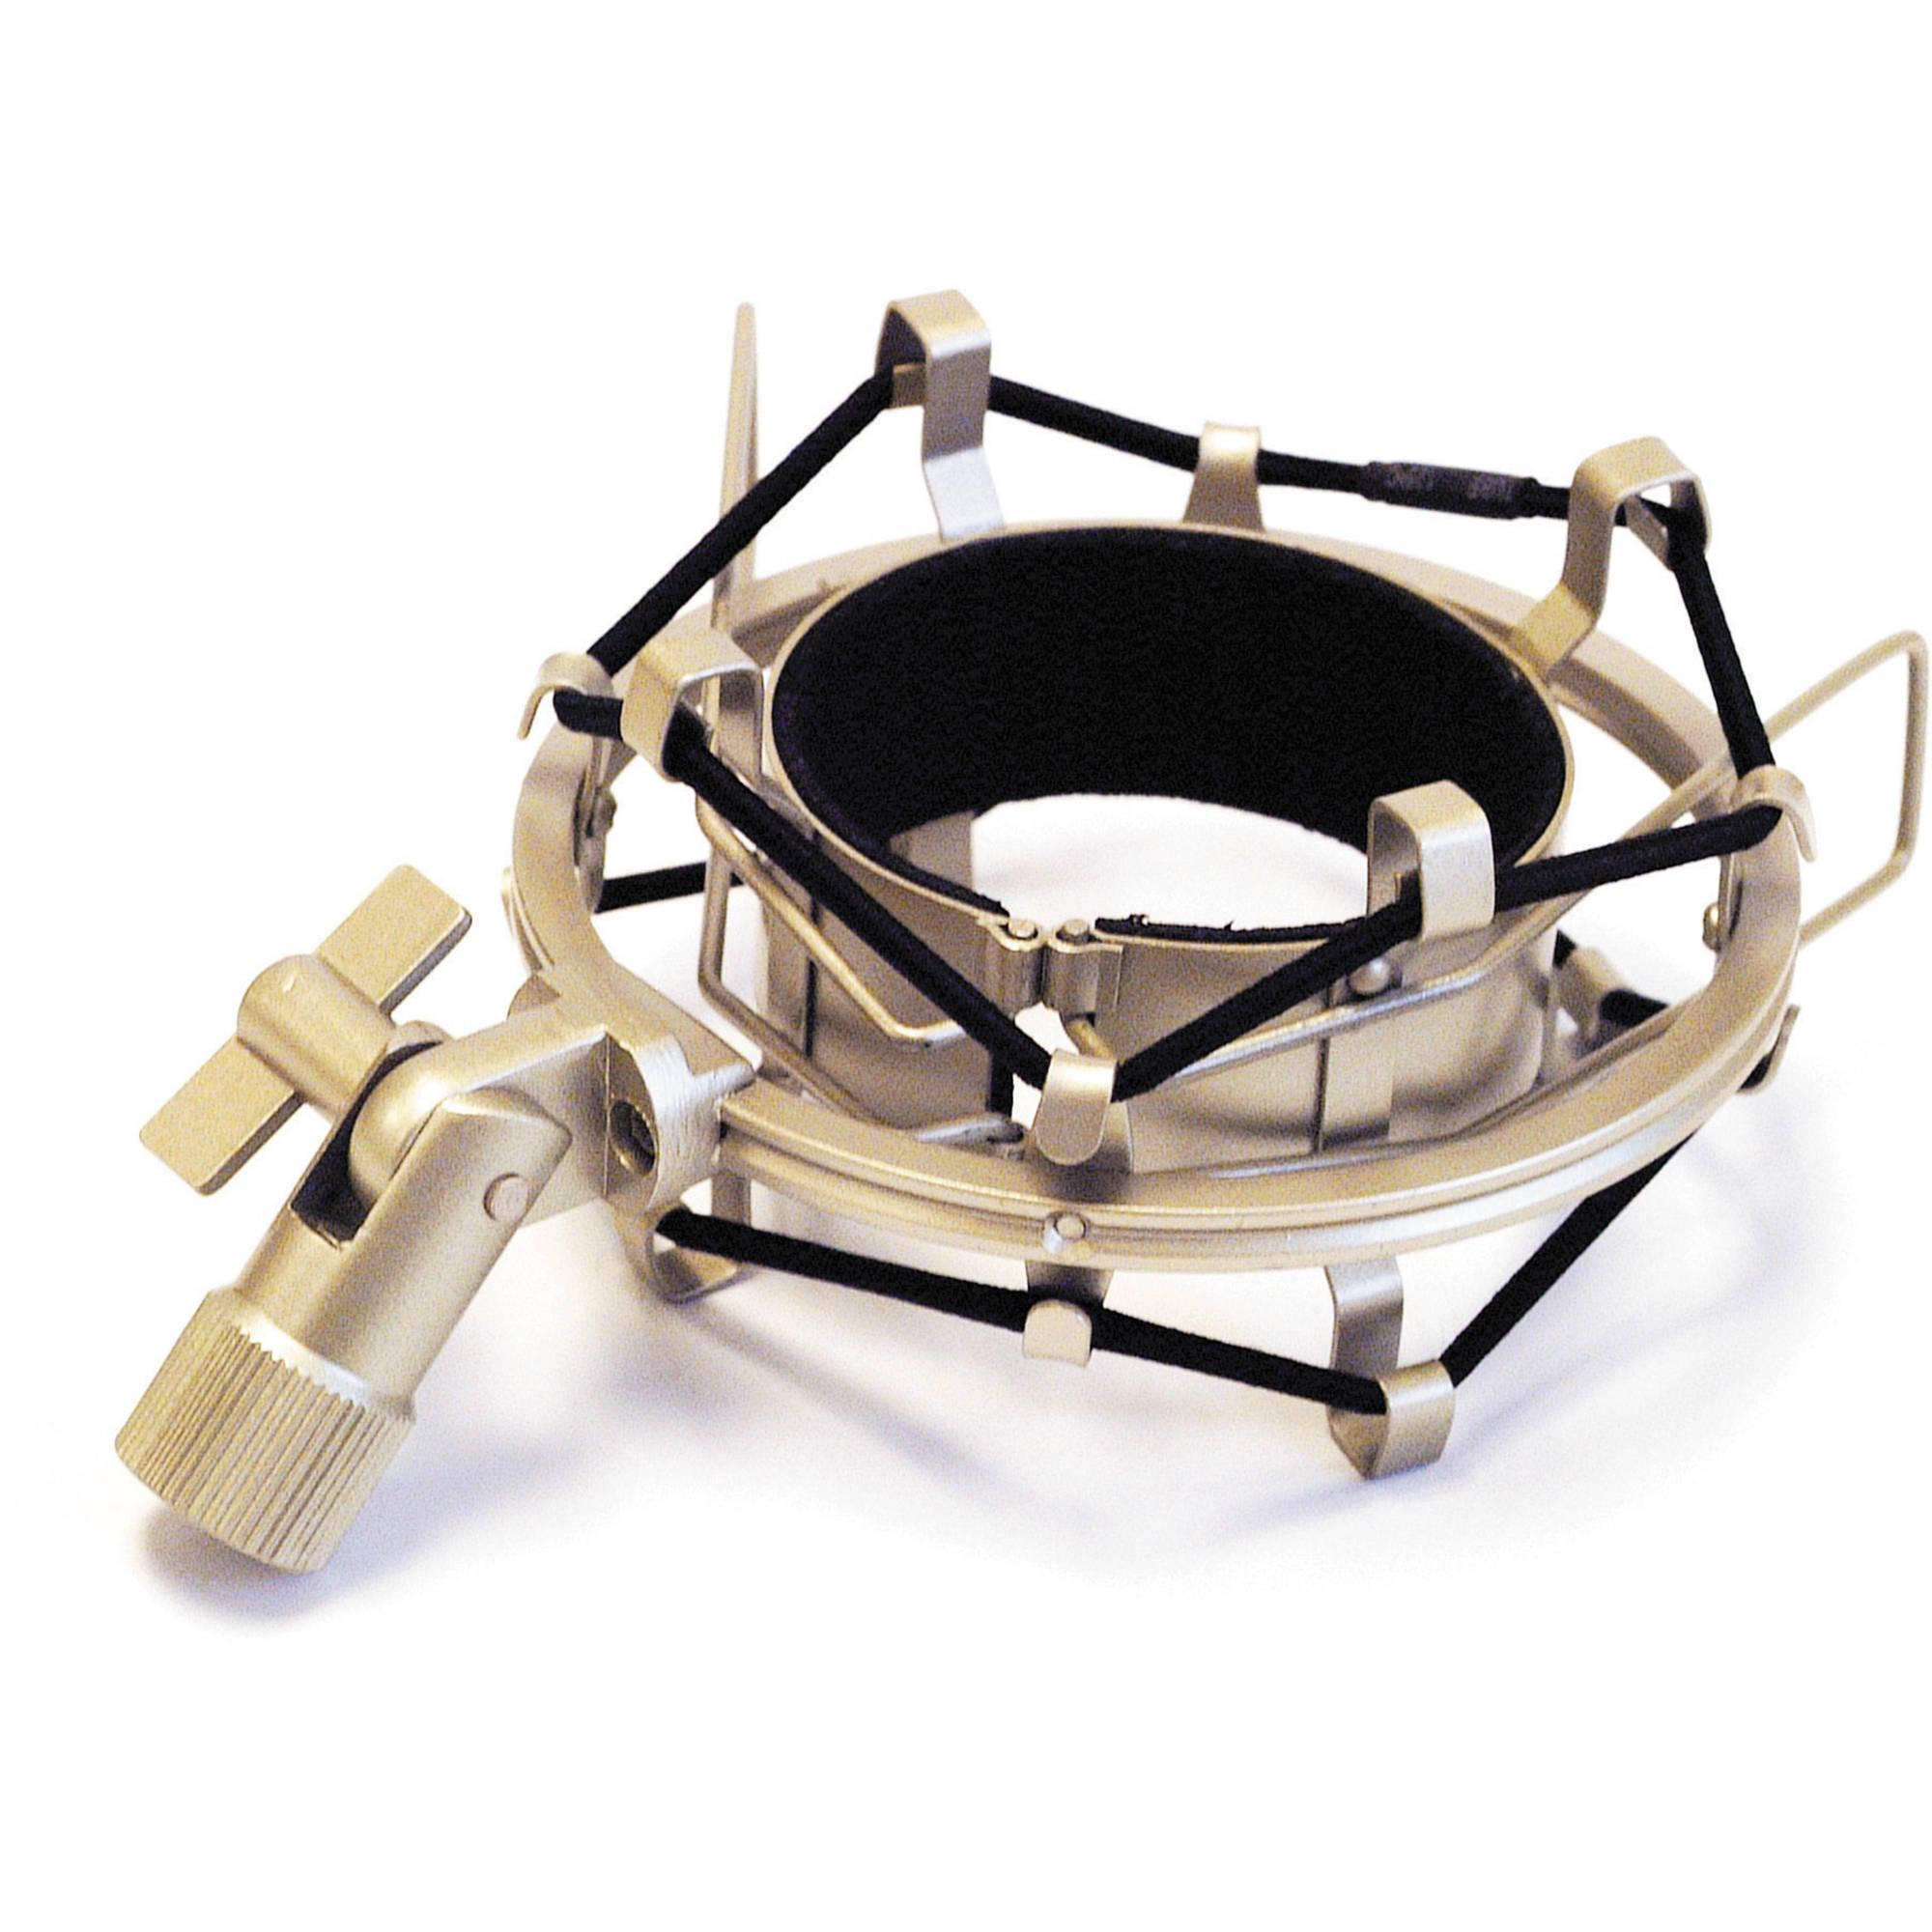 mxl mxl 90 elastic suspension microphone shock mount 90 b h. Black Bedroom Furniture Sets. Home Design Ideas